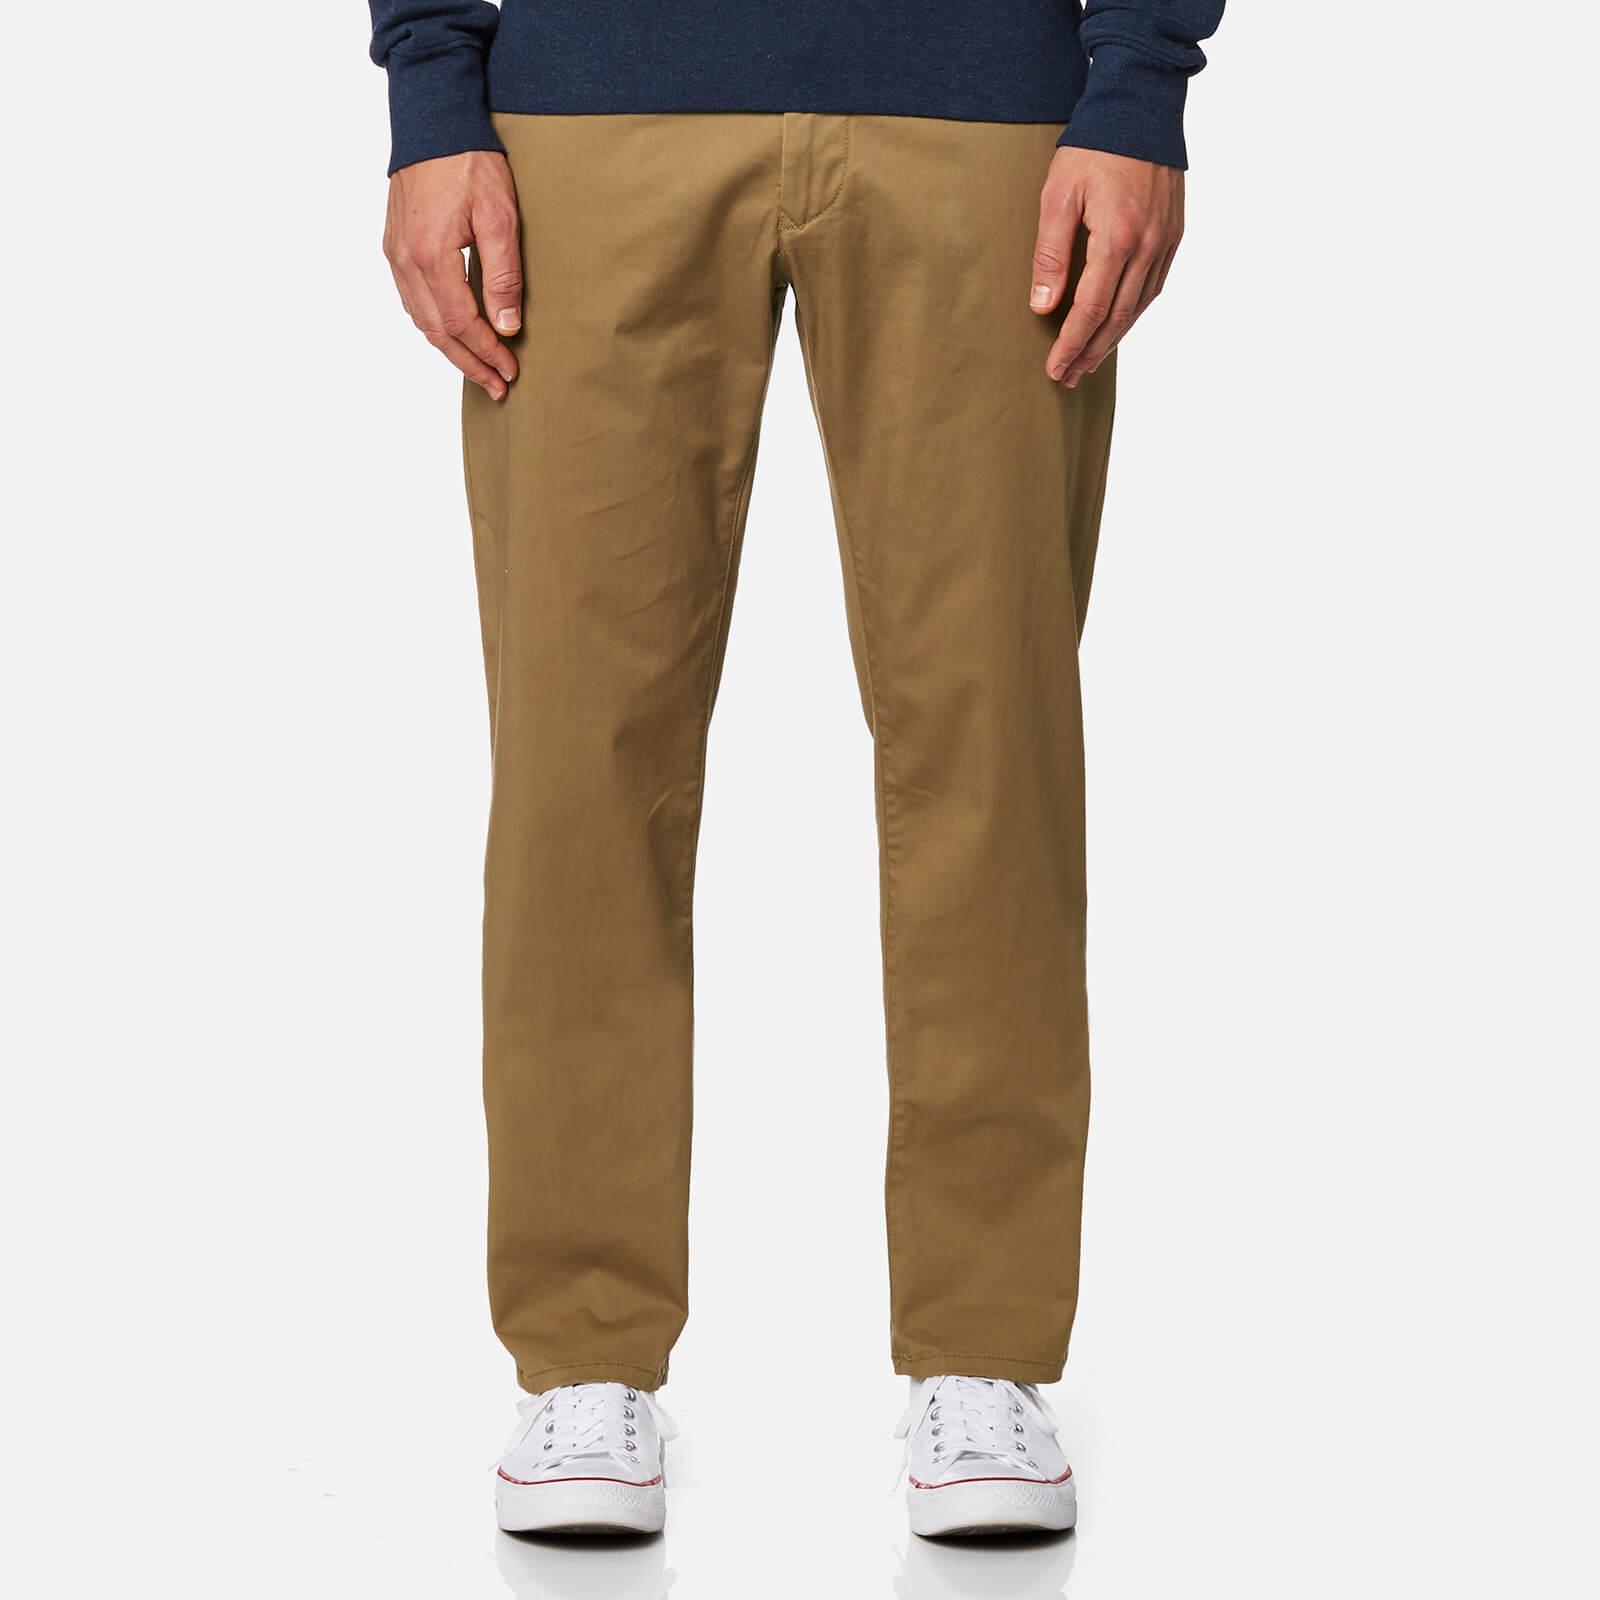 4a5161ac4f343 GANT Men's Regular Twill Chinos - Sepia Khaki Clothing   TheHut.com